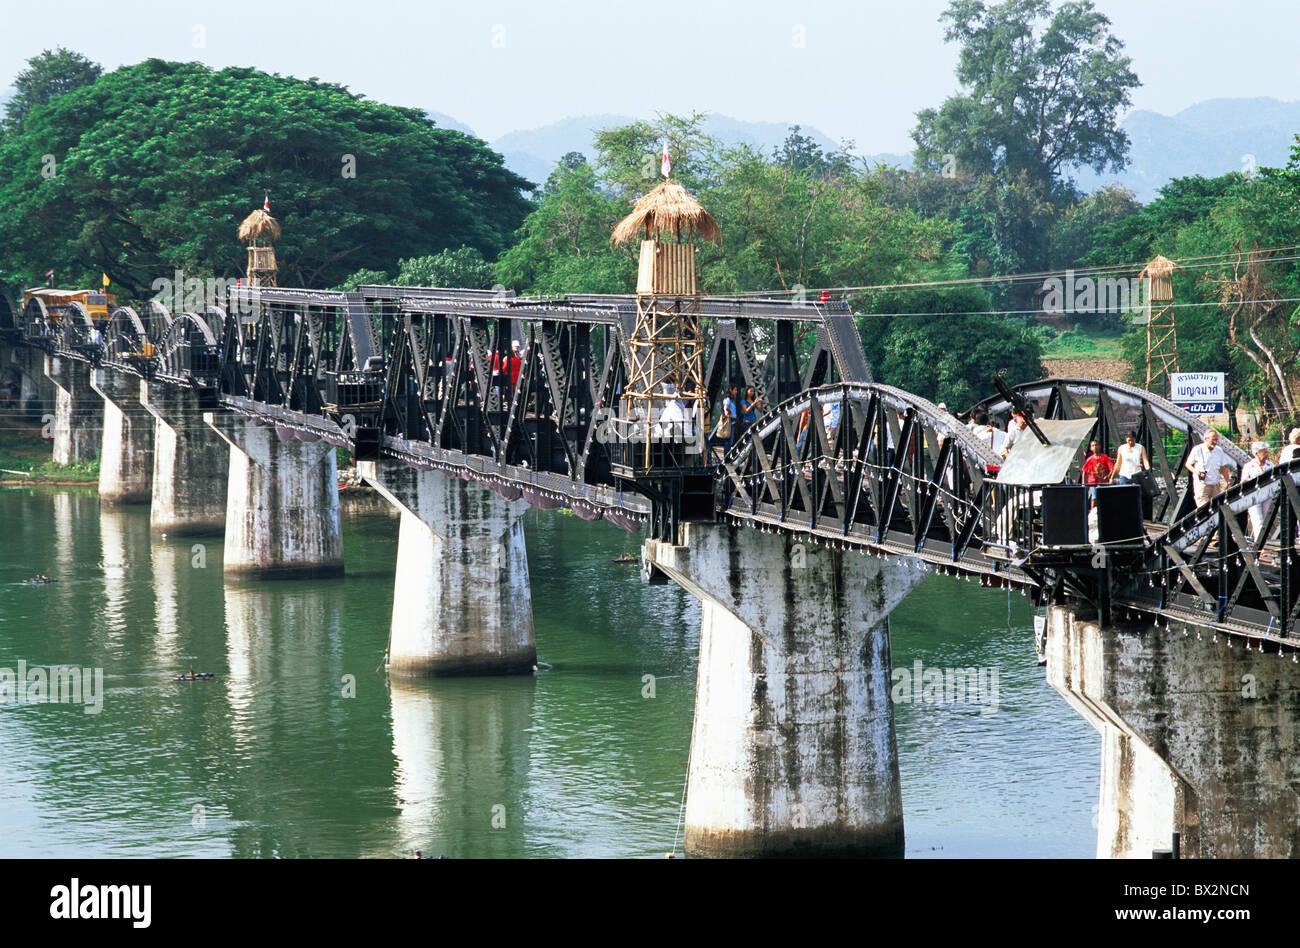 Asia Thailand Kanchanaburi Bridge over the River Kwai River Kwai Stock Photo,...